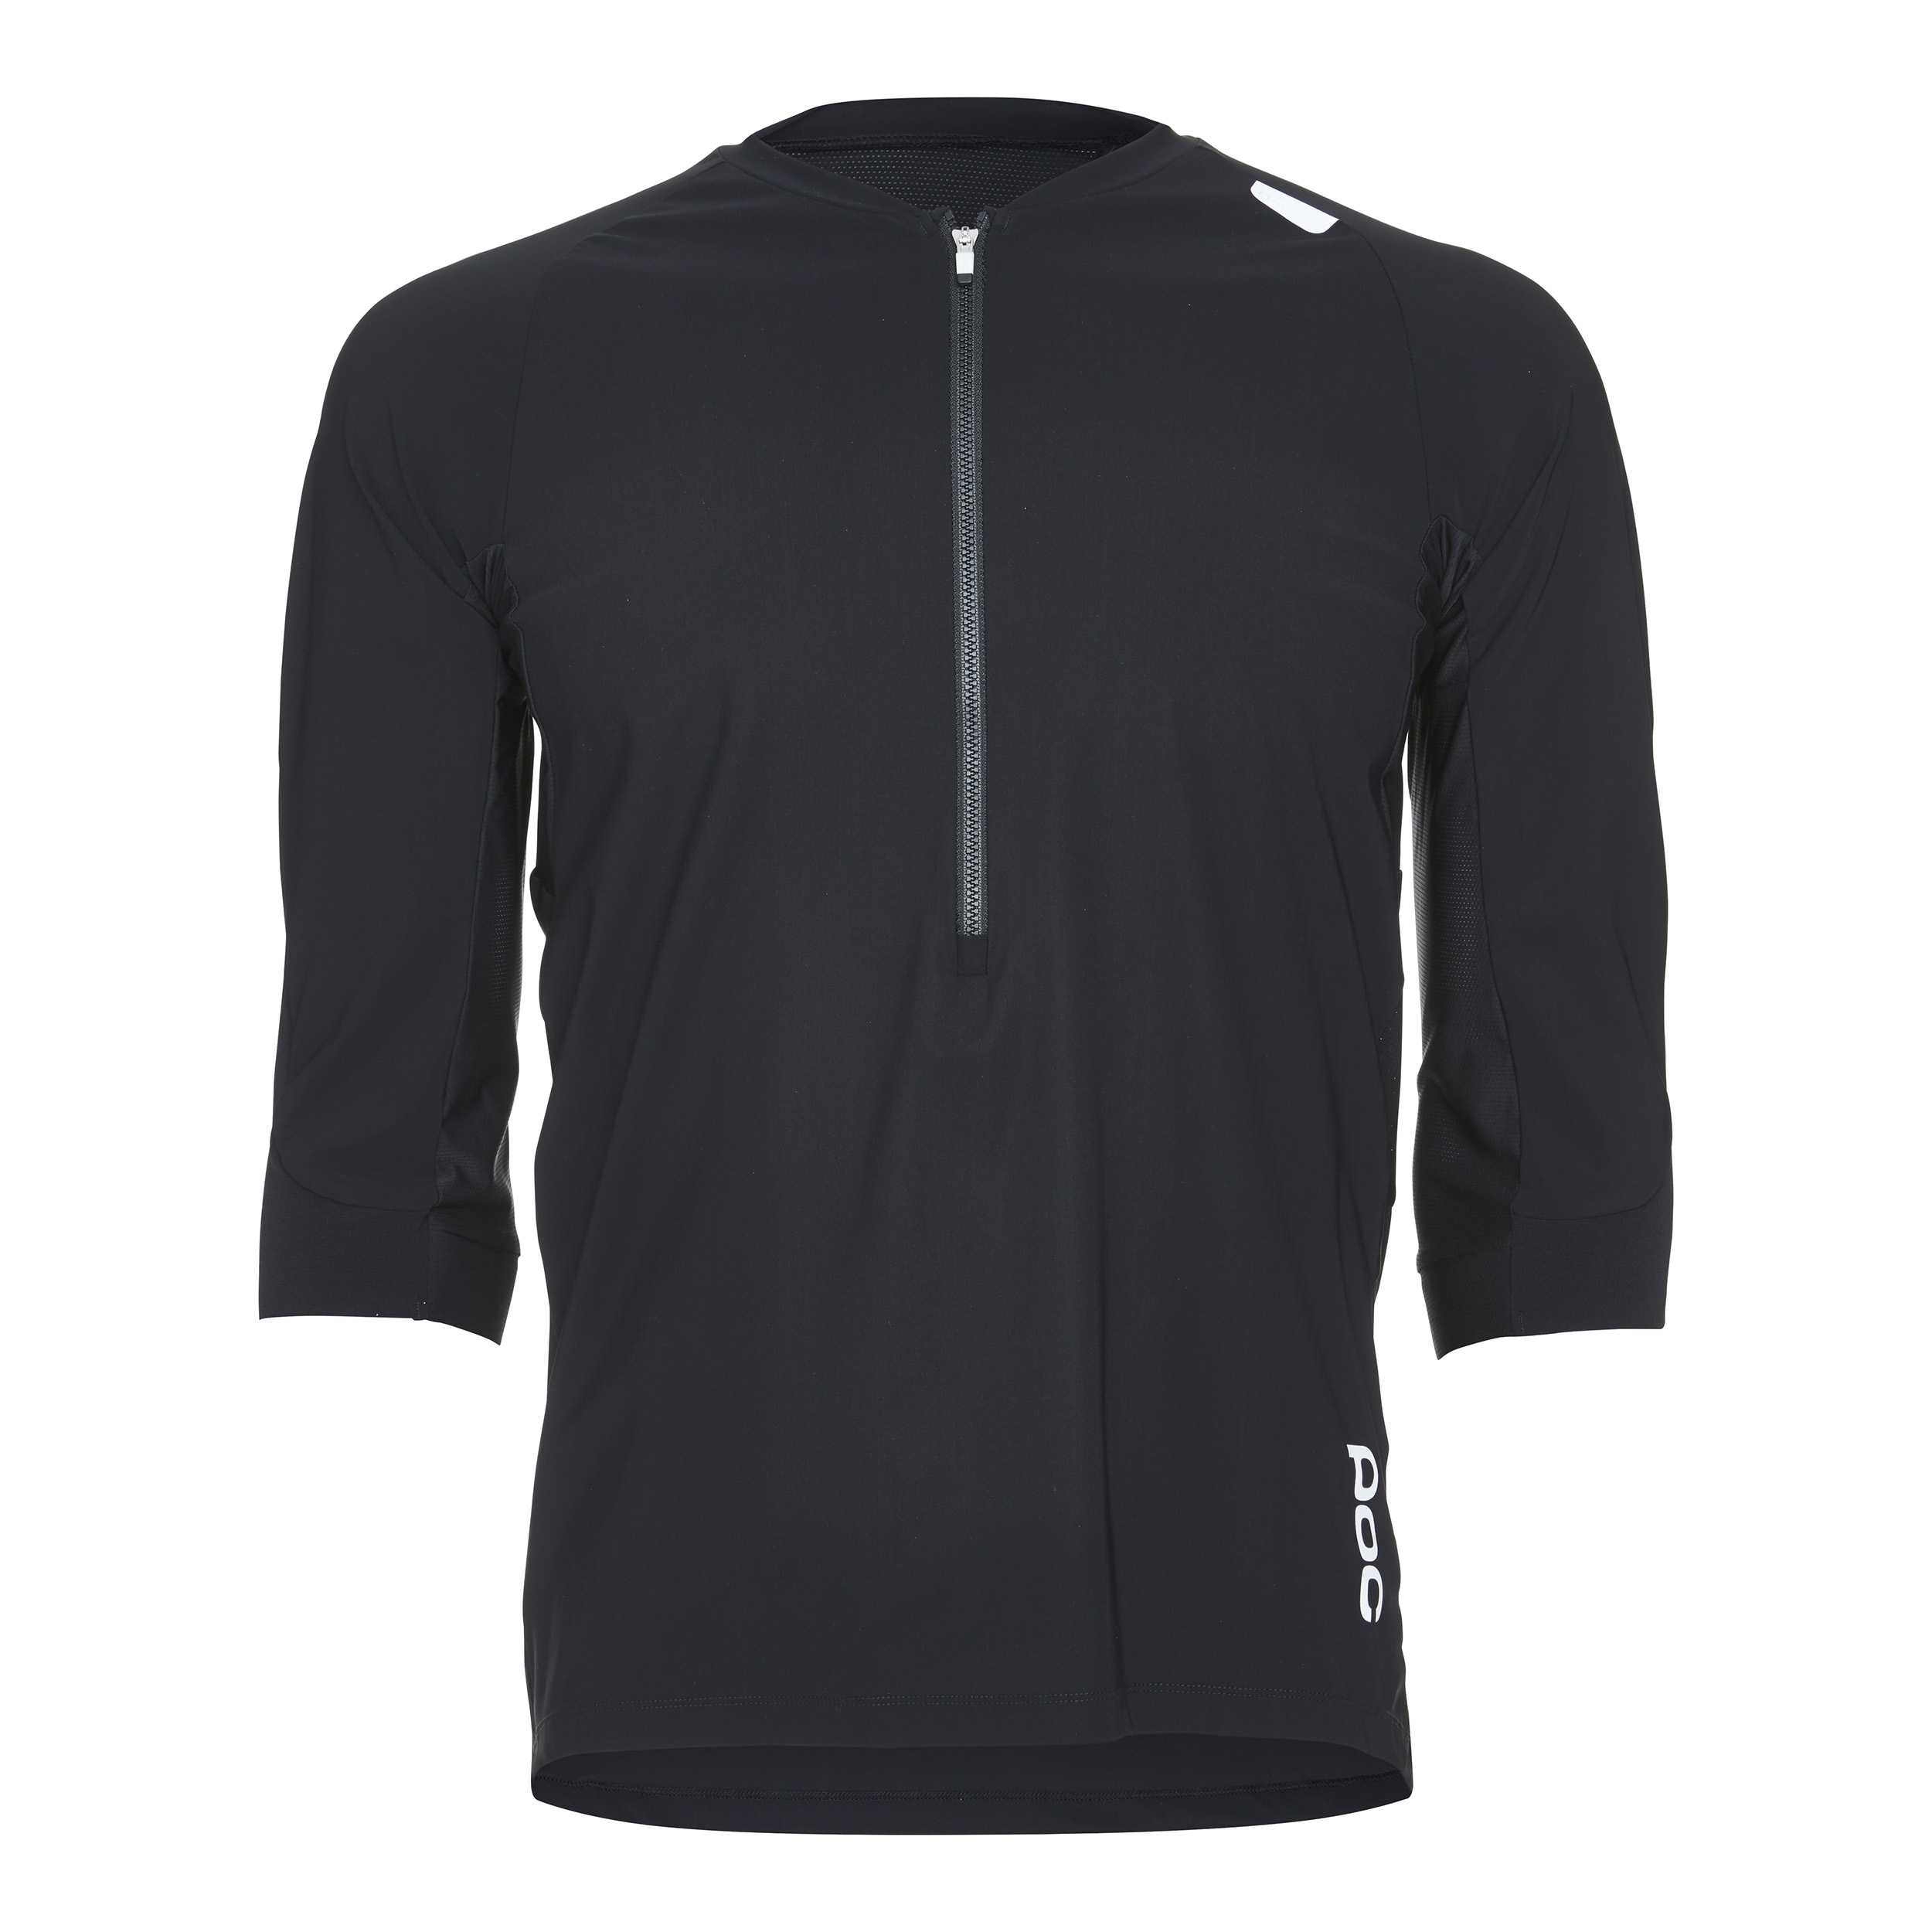 Trøje POC Resistance Enduro 3/4 sort | Jerseys